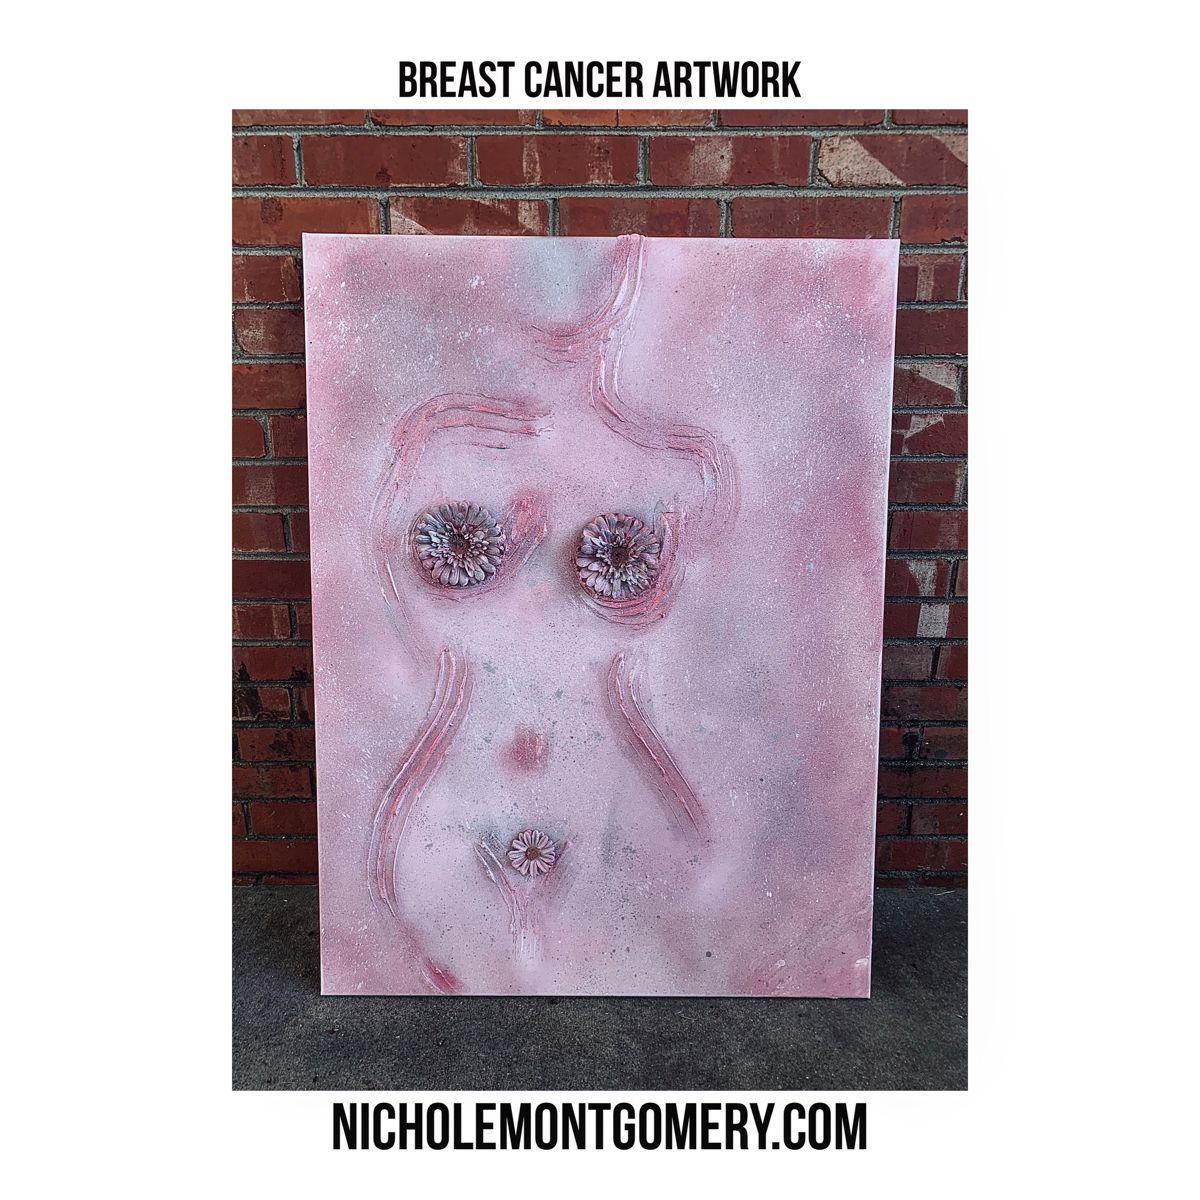 30x40 mixed media on canvas. NICHOLEMONTGOMERY.COM • #NicholeMontgomery #oklahomaartist #tulsaartist #art #artist #canvaspainting #canvasart #canvas #mixedmedia #painting #nude #woman #mother #aunt #grandmother #child #sister #breastcancerawareness #exhibit #breastcancerawarenessmonth #breastcancer #pink #fuckcancer NicholeMontgomery.com